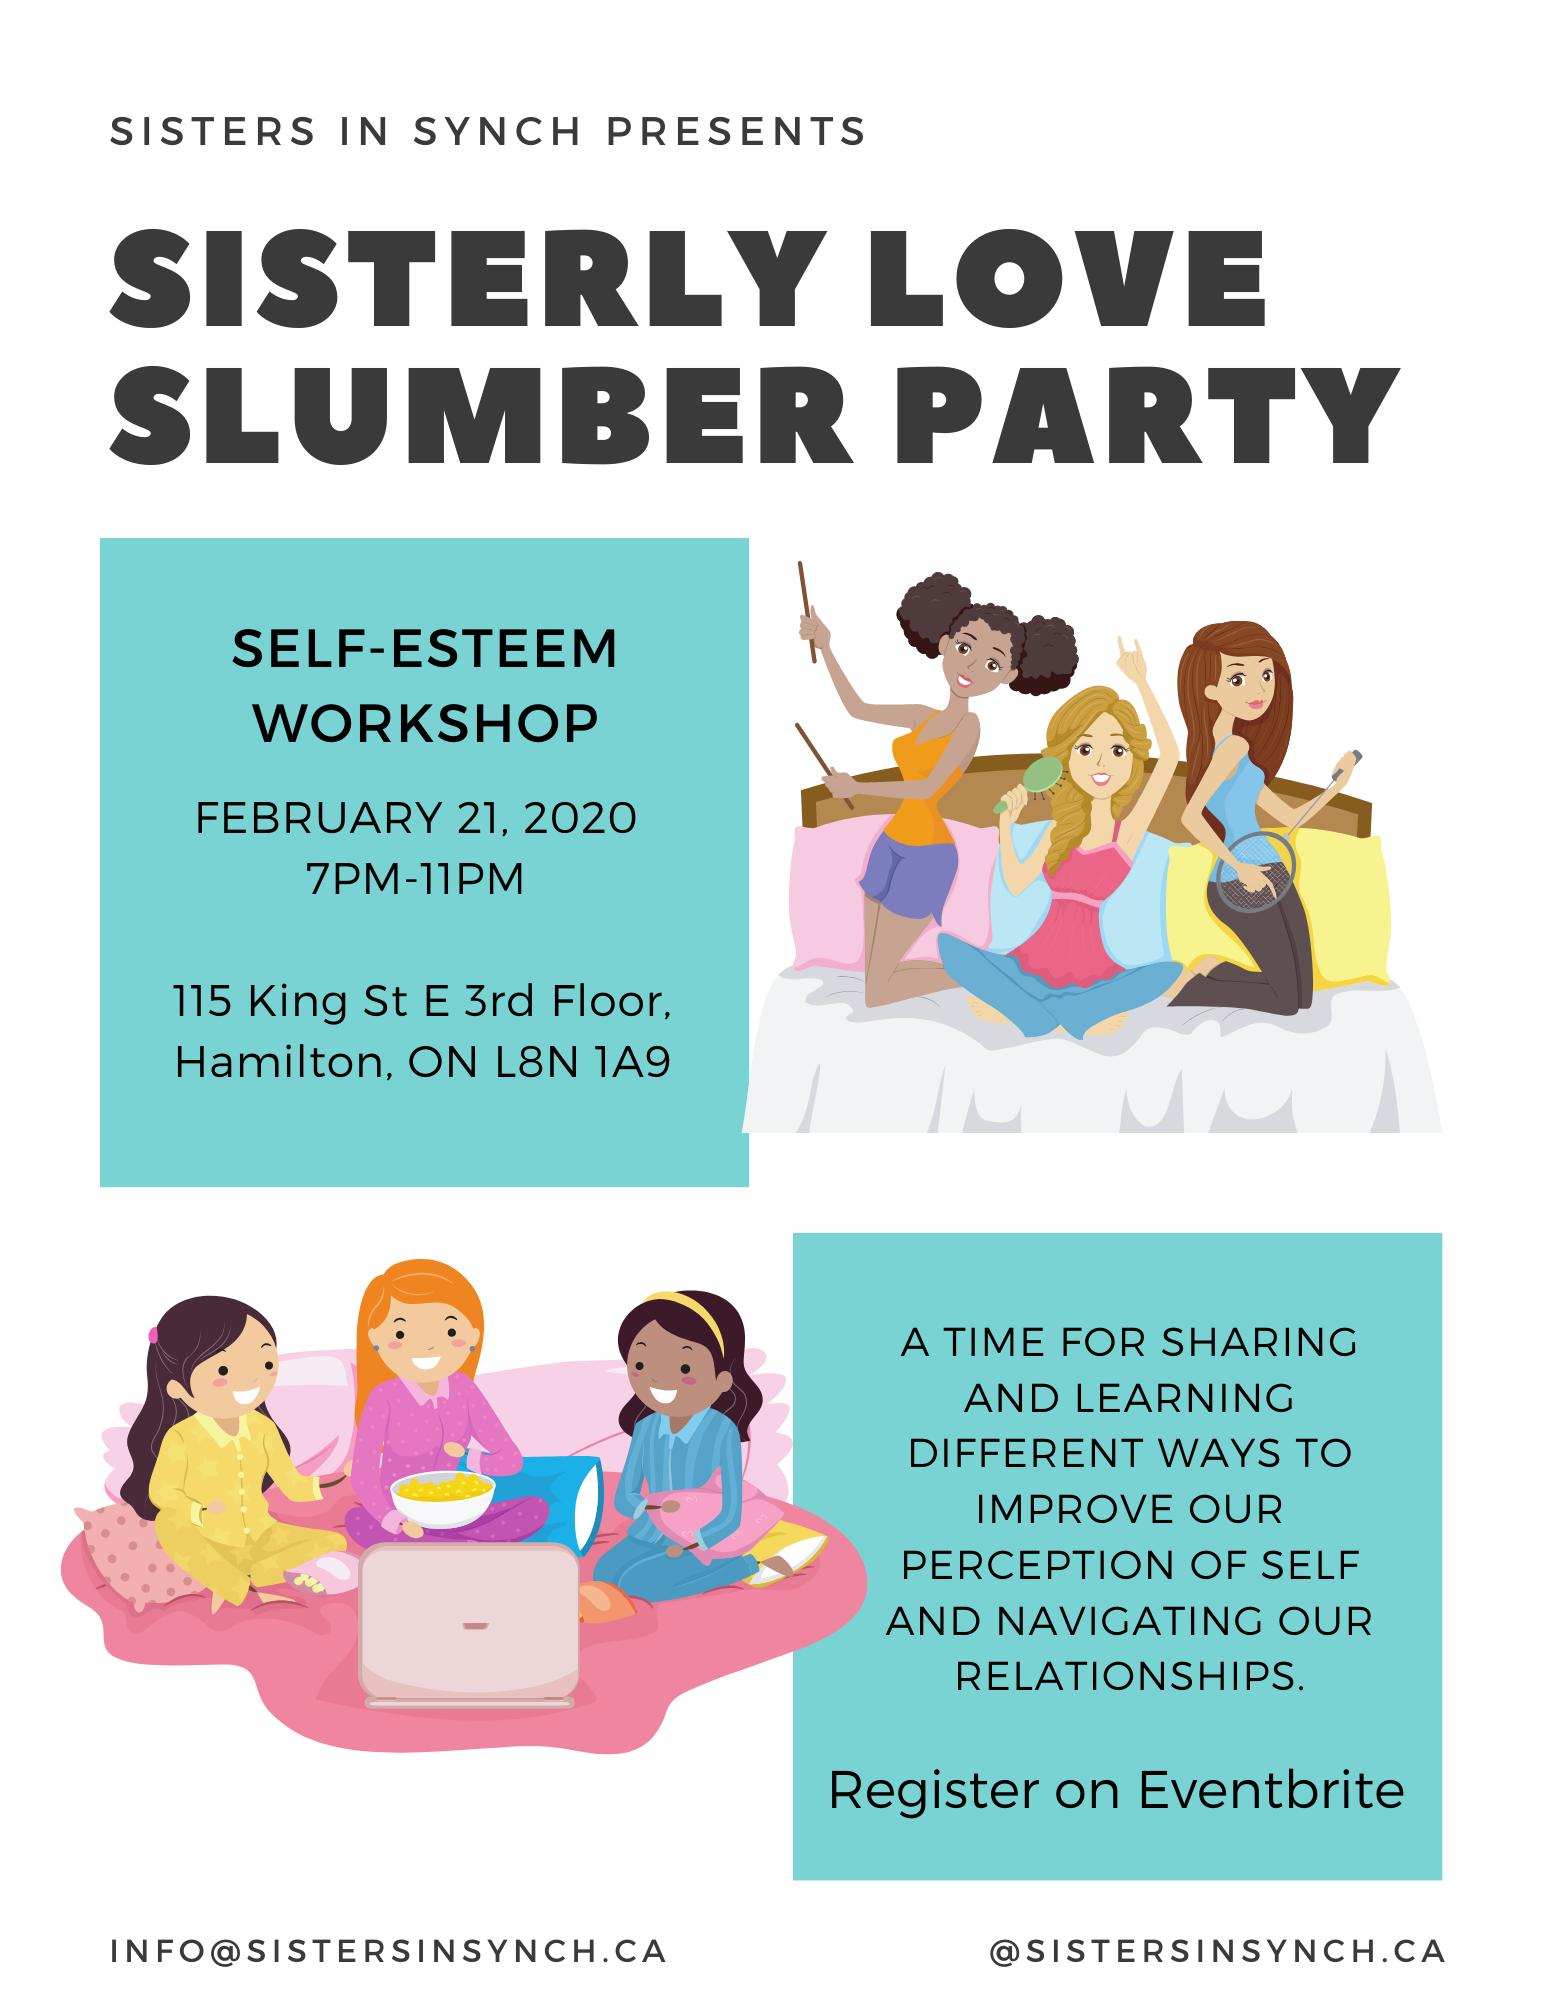 Sisterly Love Slumber Party: Self-Esteem Workshop